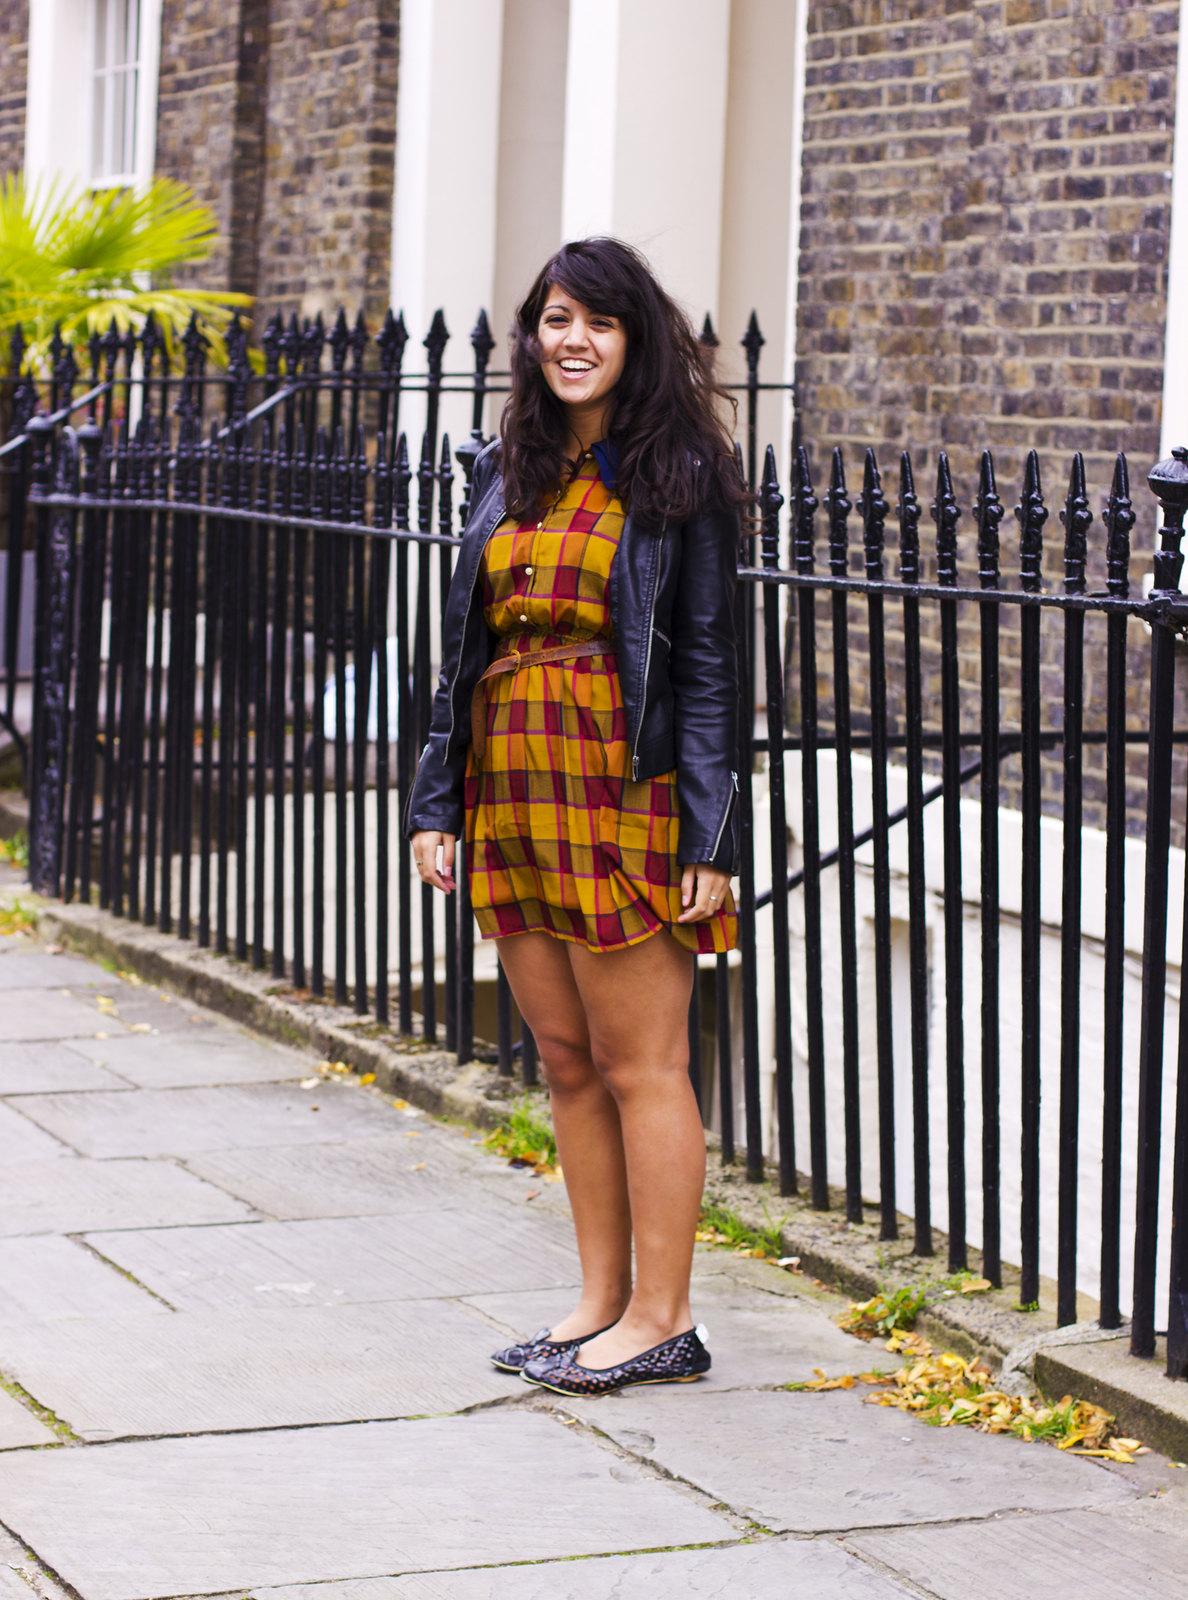 Miss Patina Dress Laila Tapeparade blog kings cross where I work railings shoes bunnies bunny rabbit face shoes check dress fake leather jacket Irregular Choice